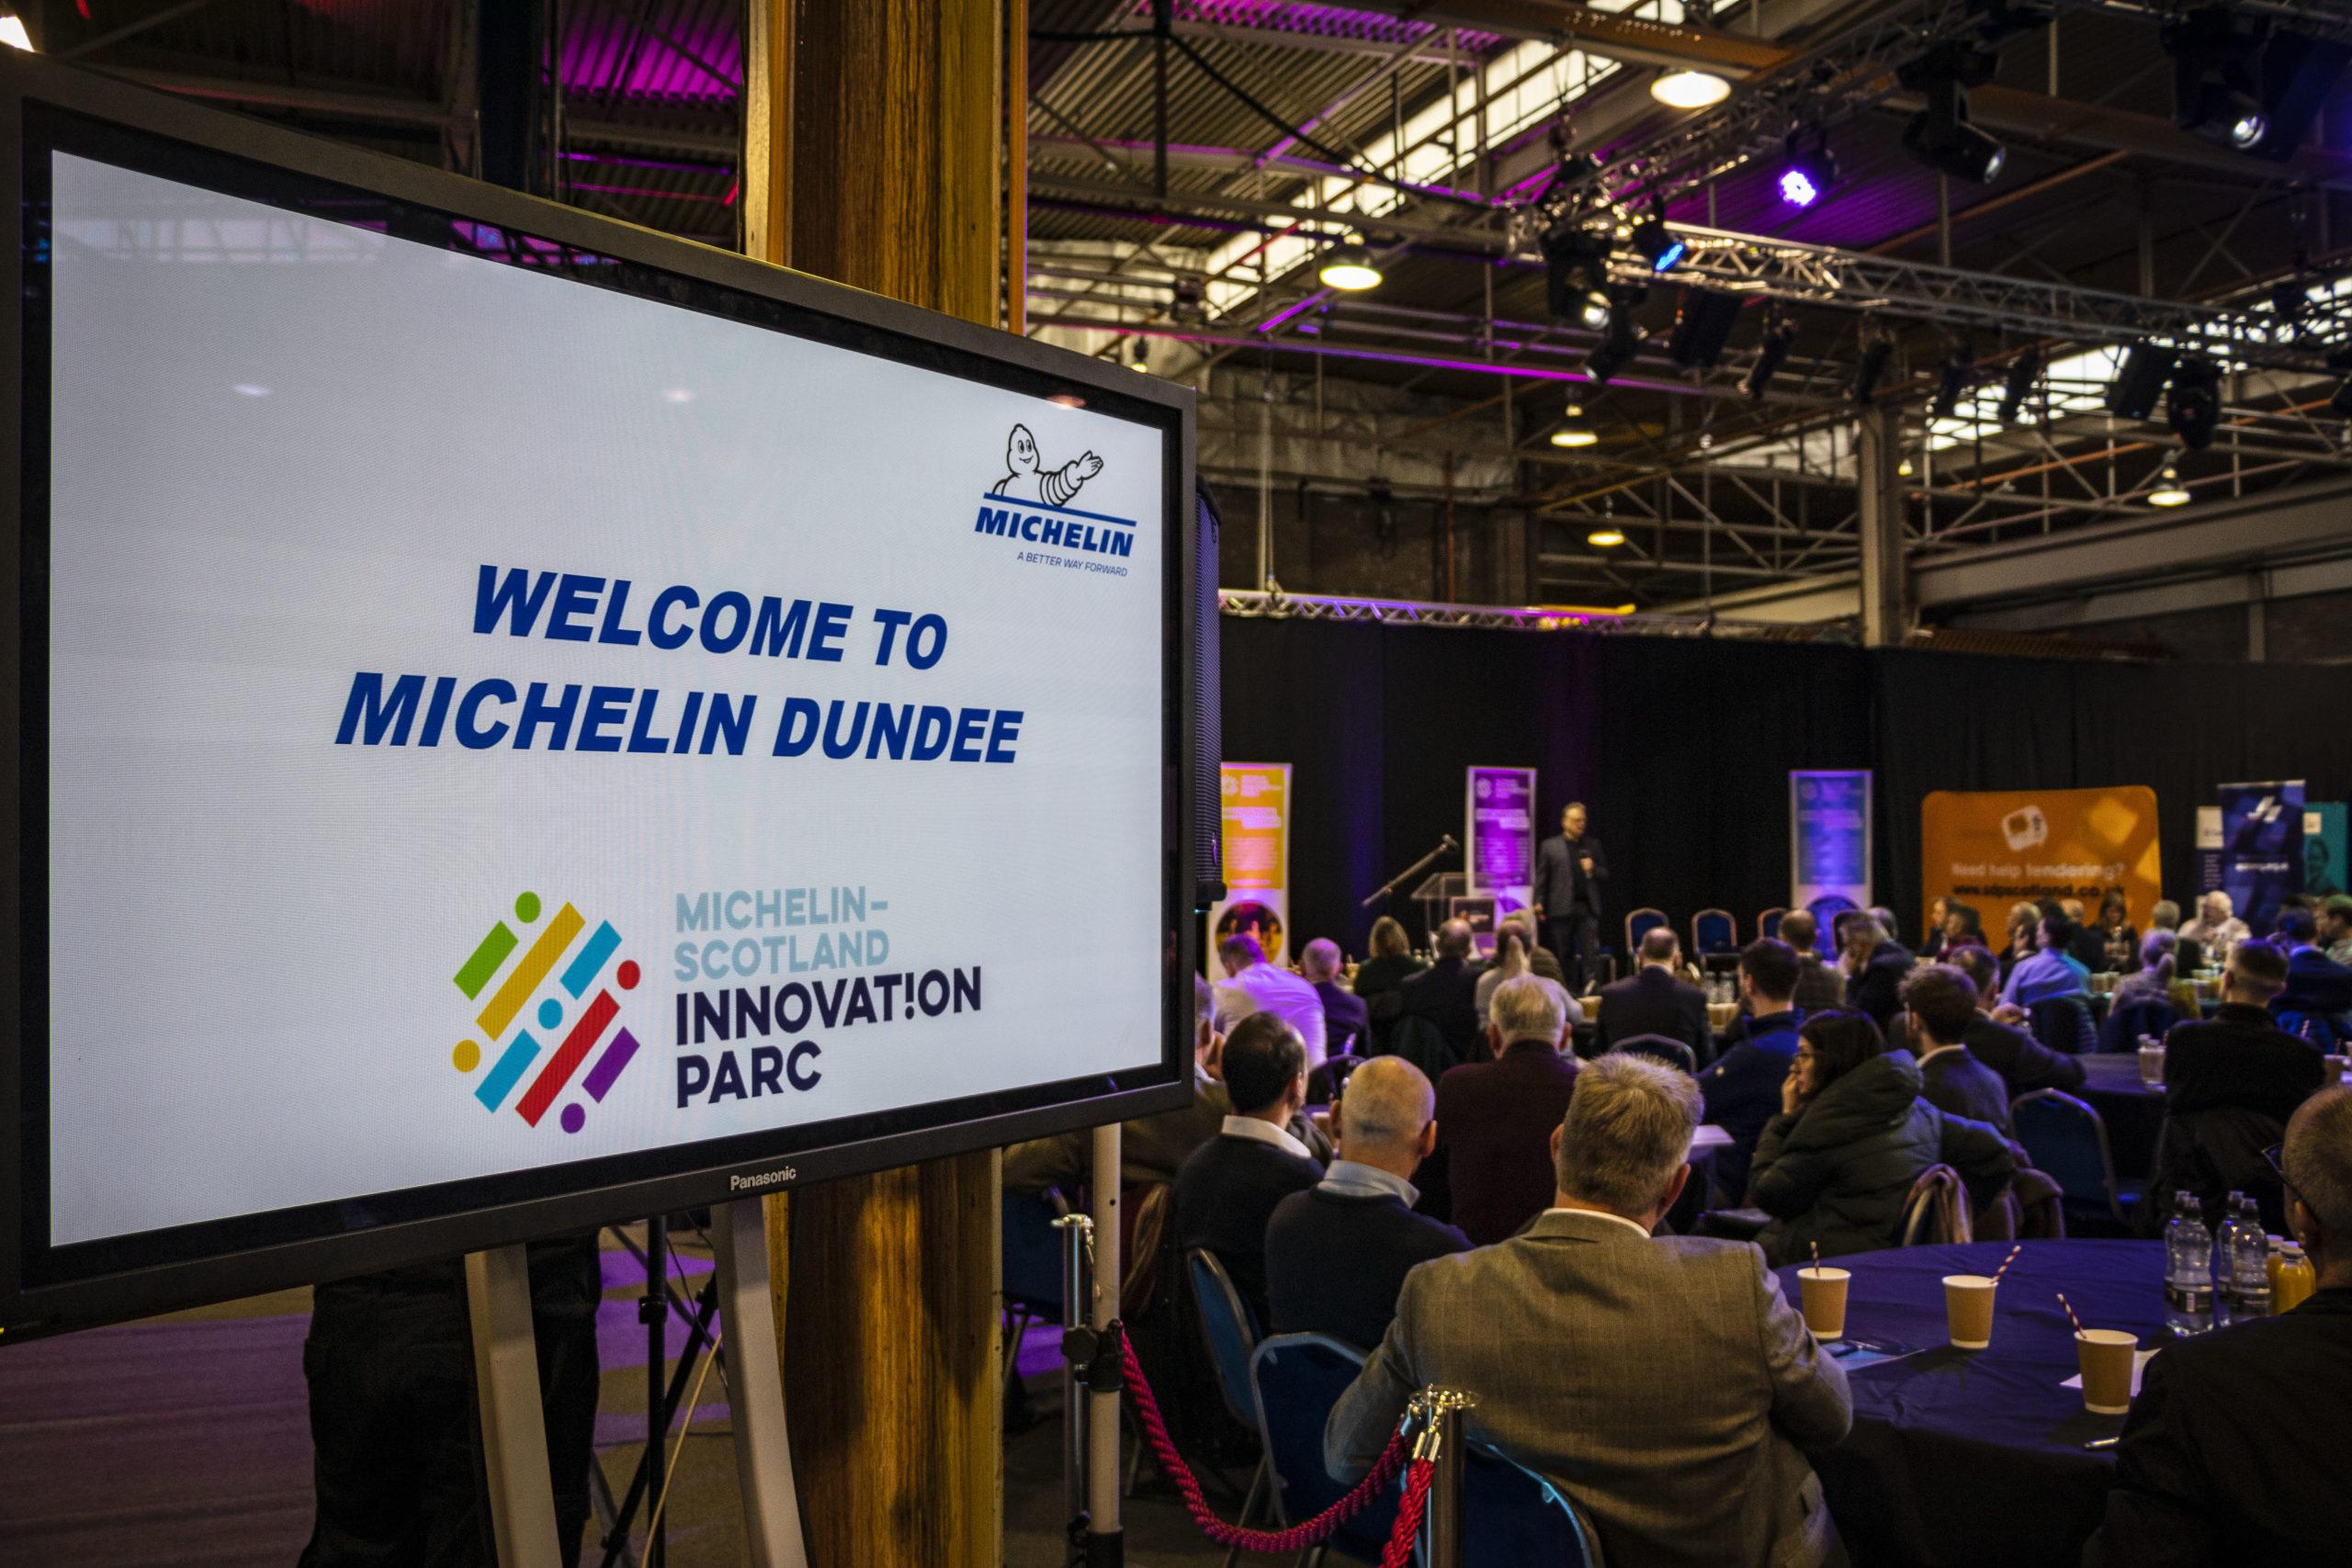 Dundee's Entrepreneurial Ecosystem